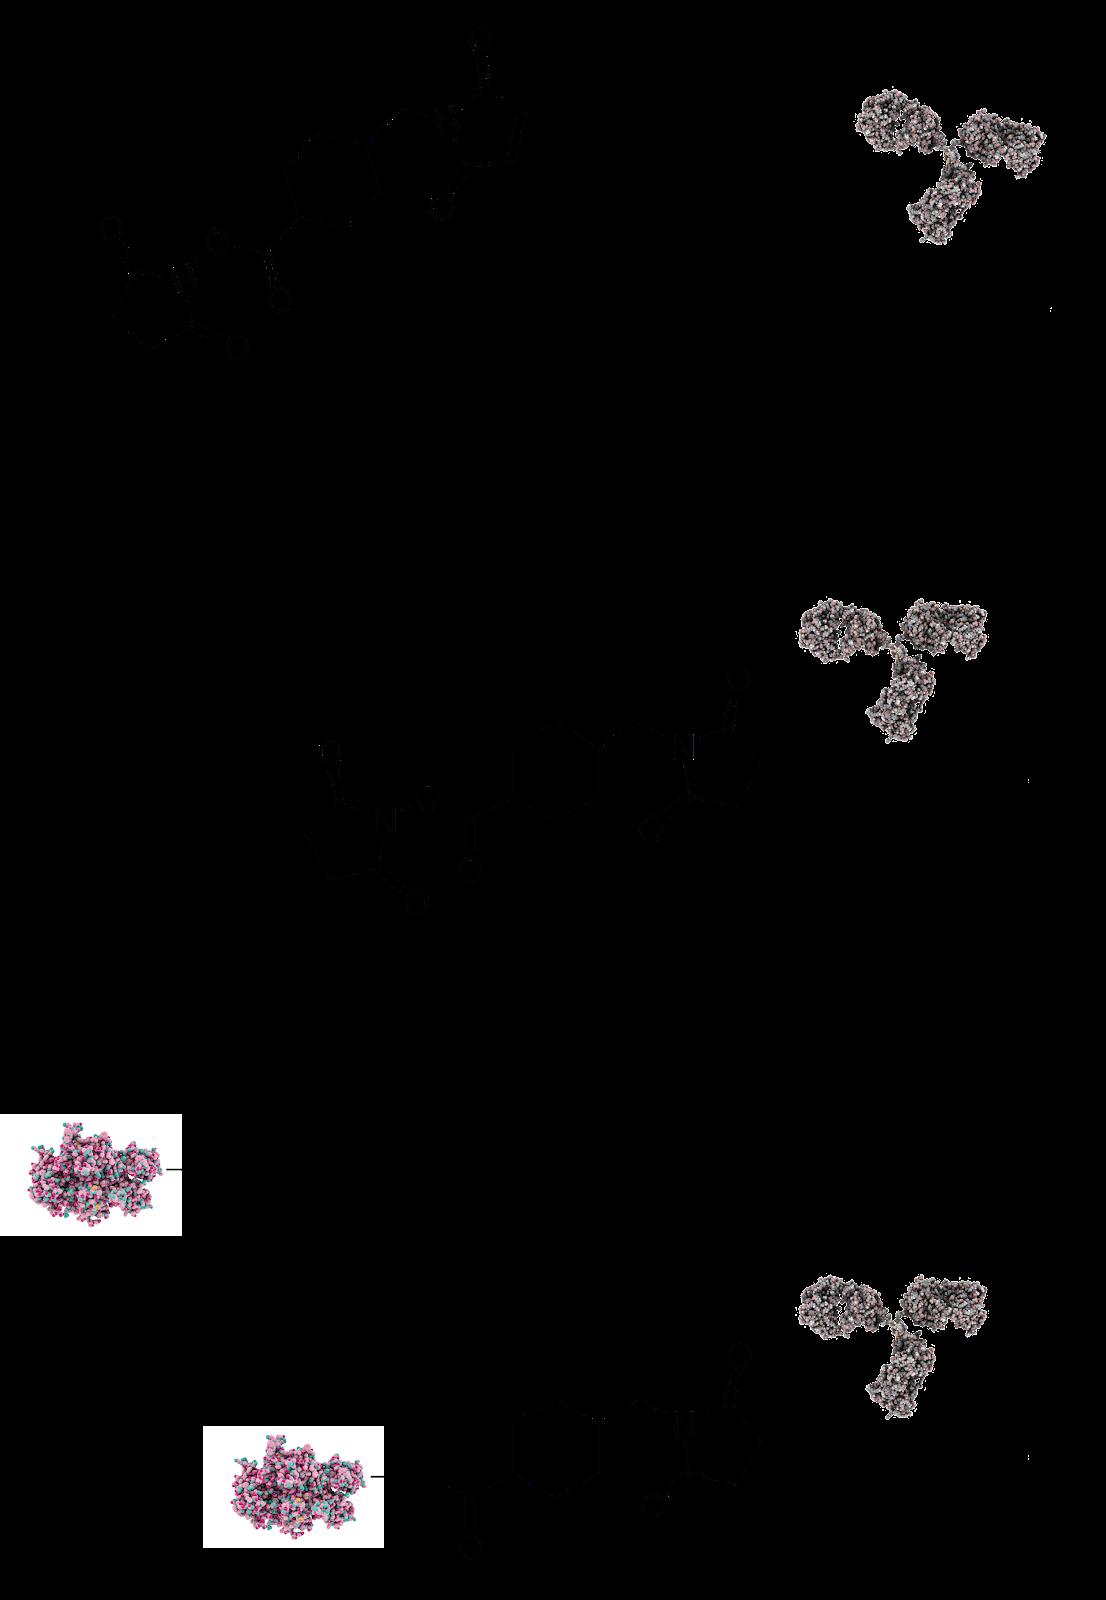 protein protein conjugation techniques utilize crosslinkers